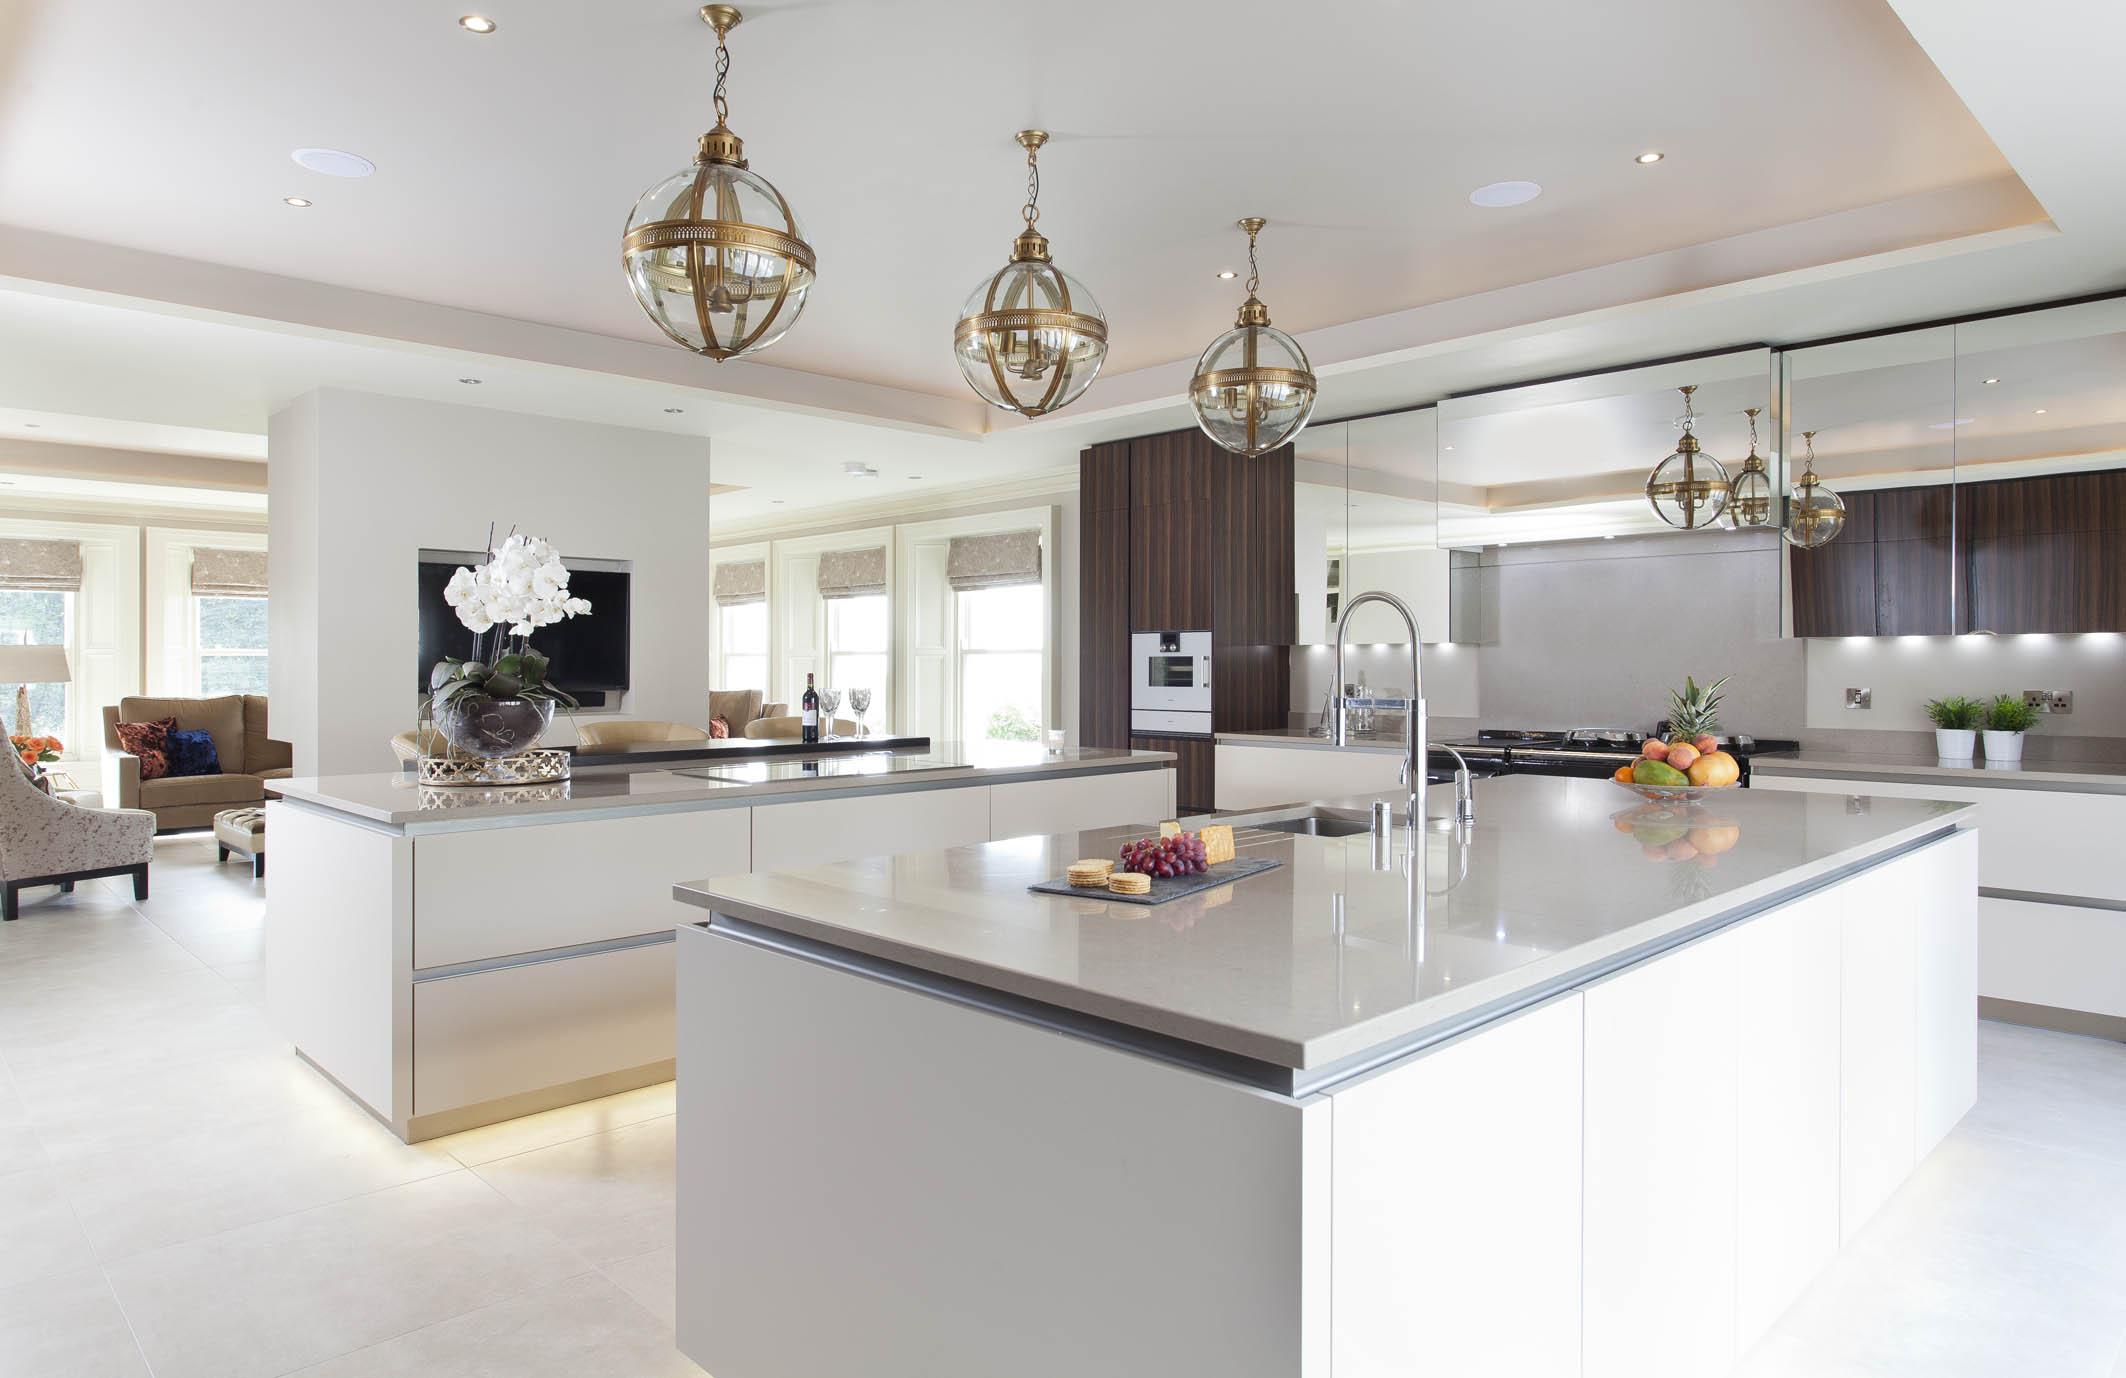 Image Result For Kitchen Design Pictures